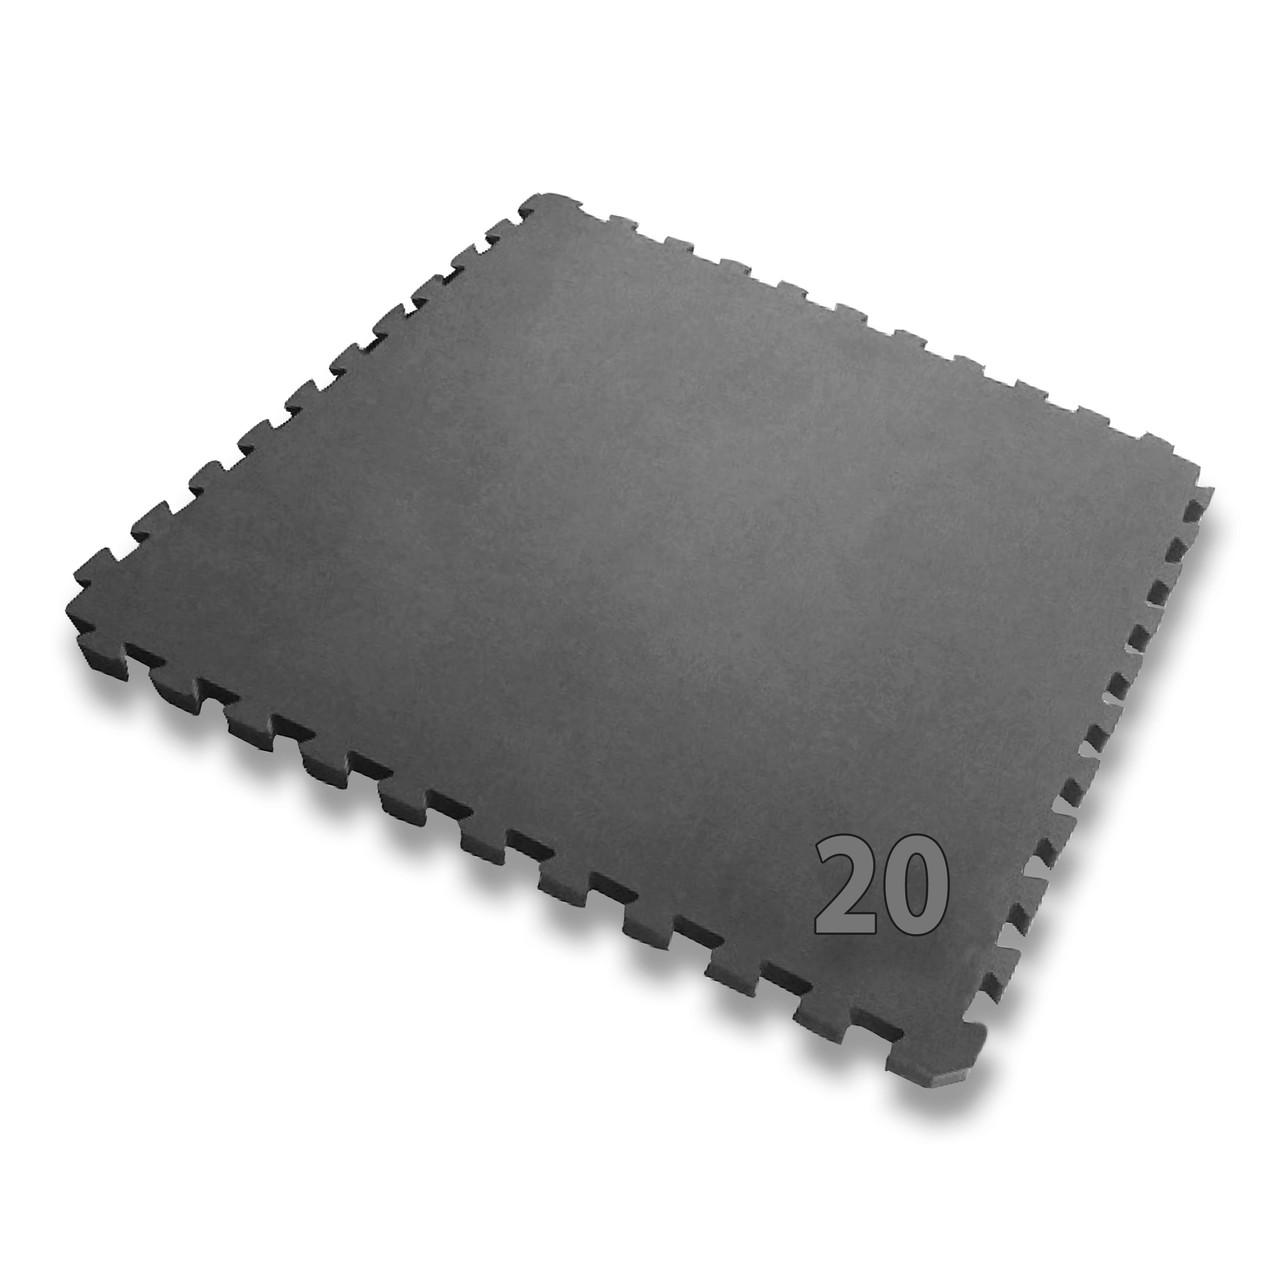 Лист 20 мм ППЭ НХ (Украина), серый